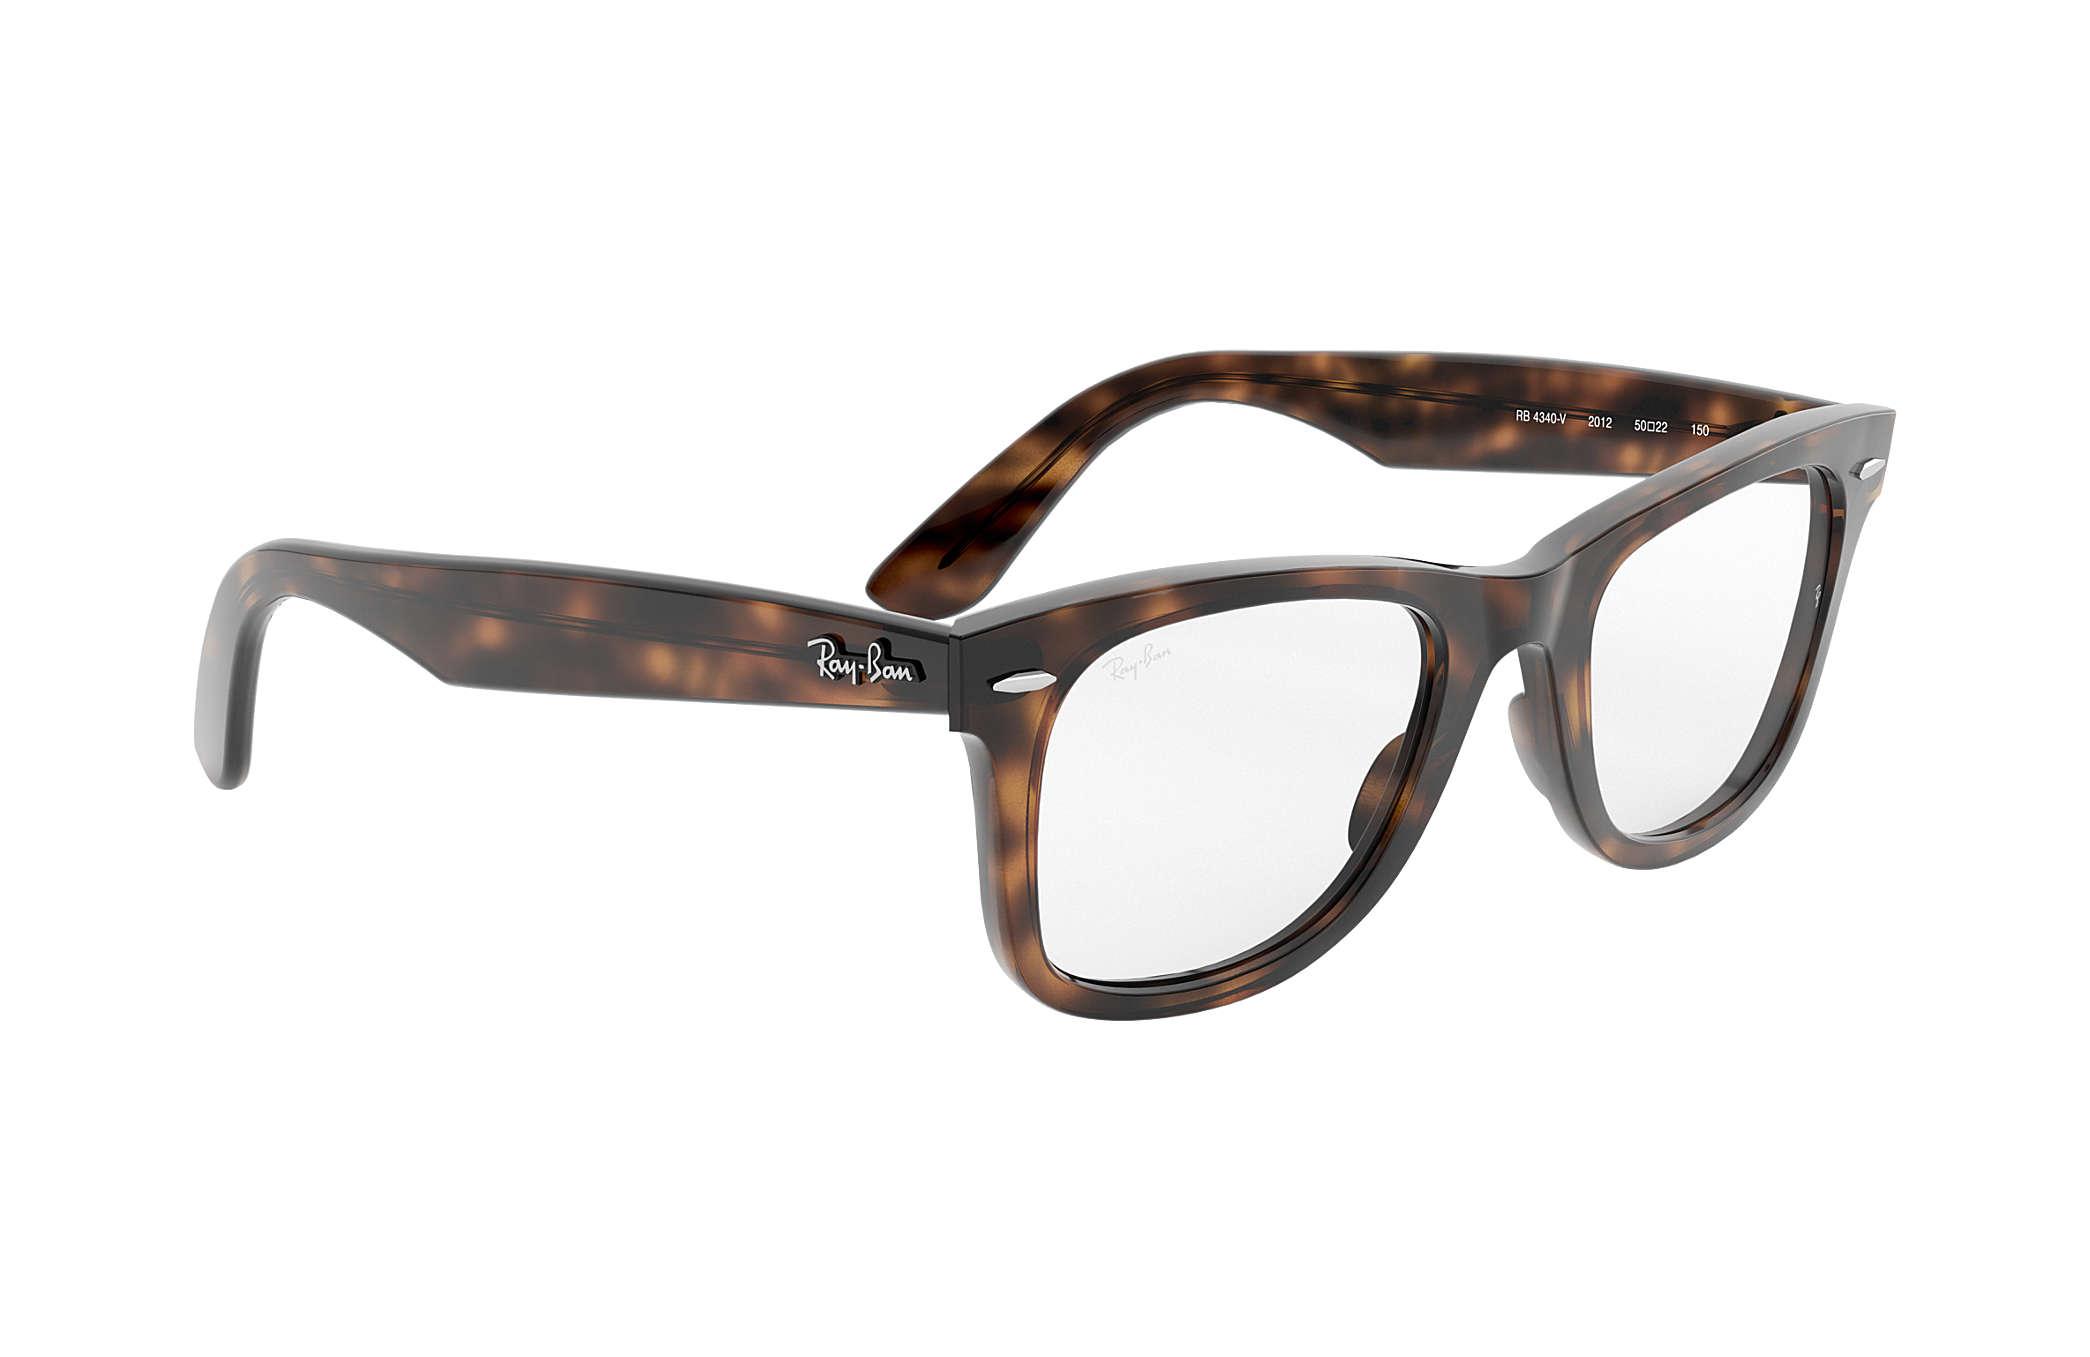 801b66584b Ray-Ban prescription glasses Wayfarer Ease Optics RB4340V Tortoise ...